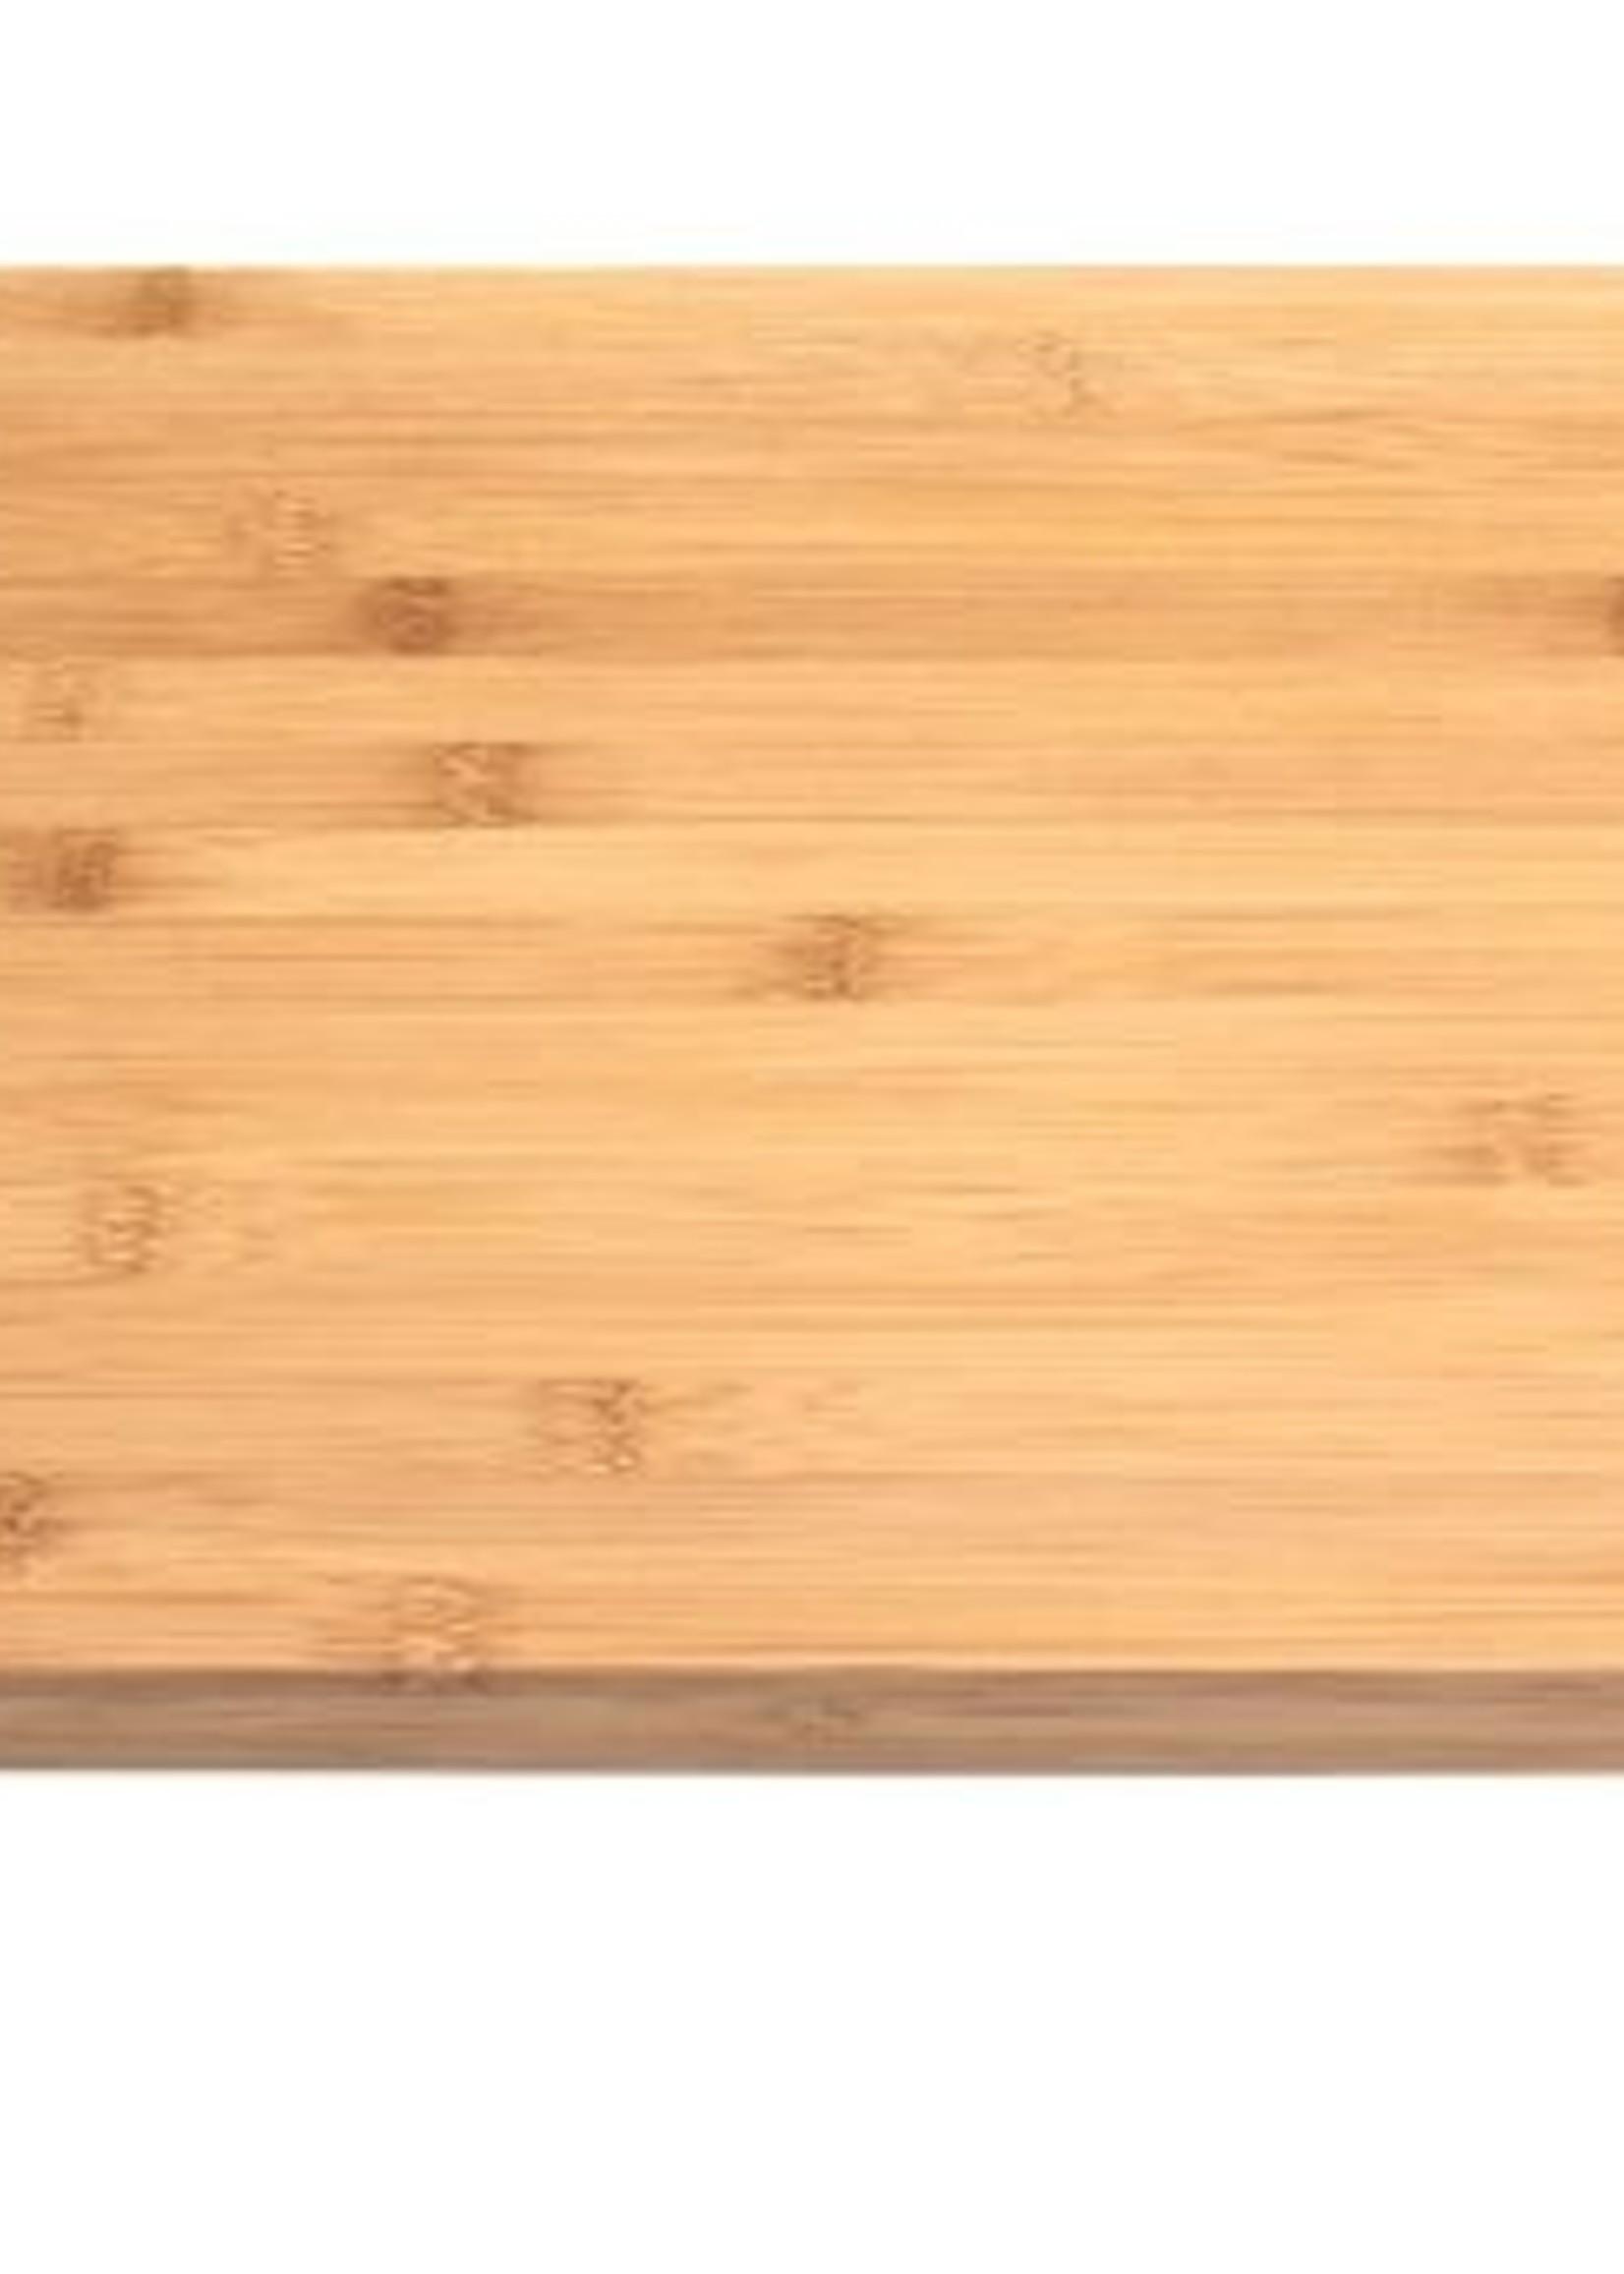 Höfats Crate Vuurkorf Bamboe Plank